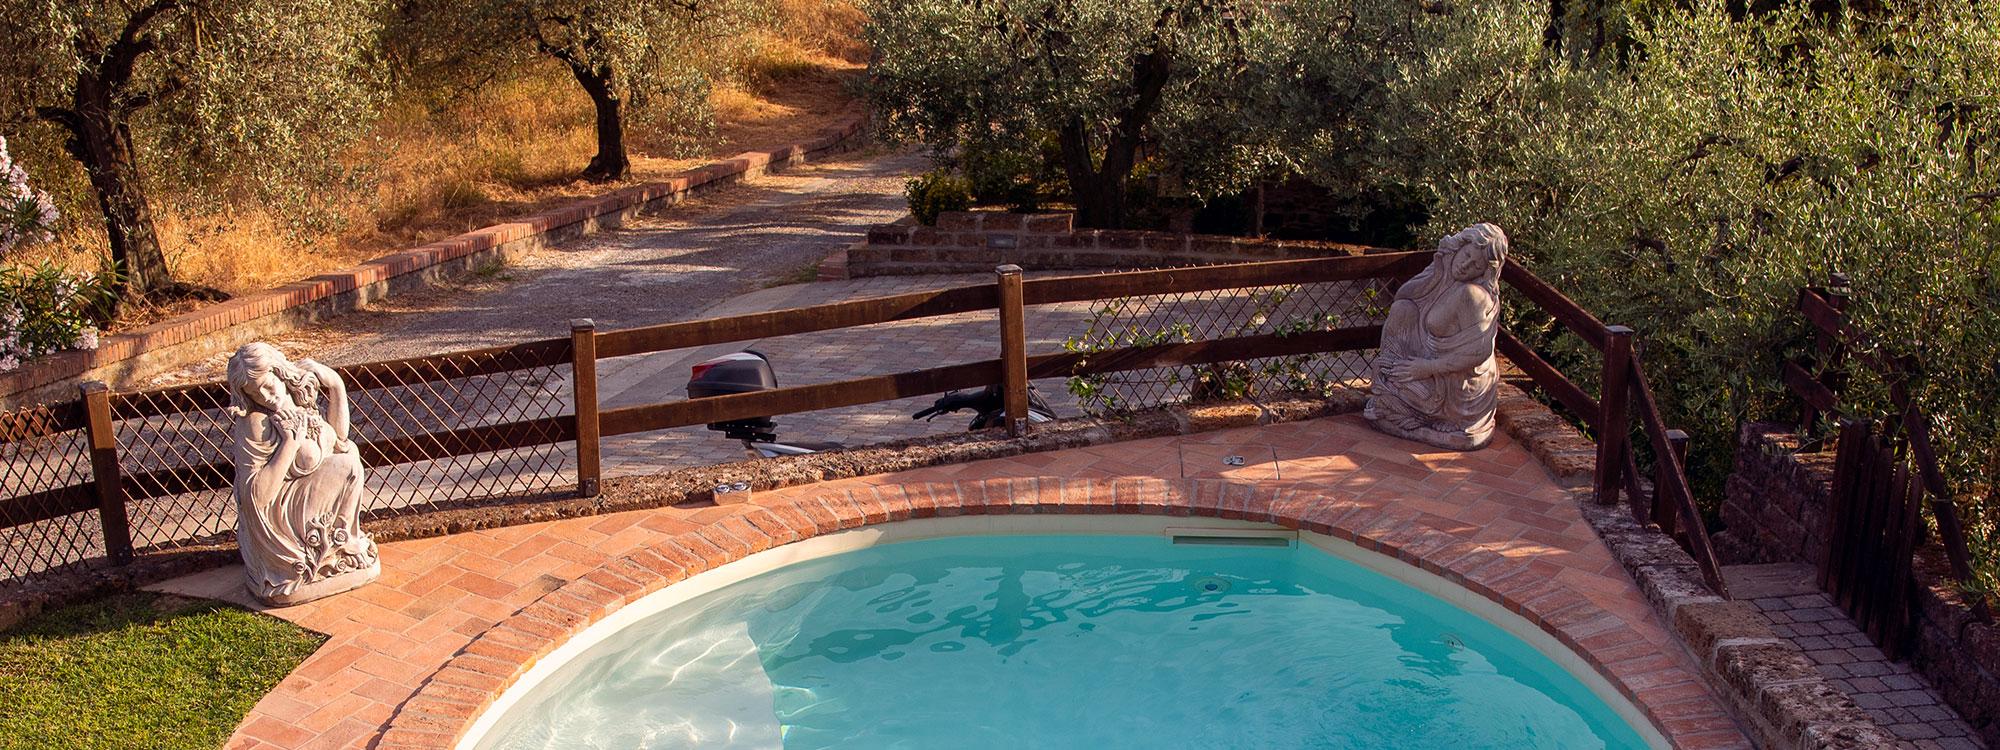 Swimming pool – Slide